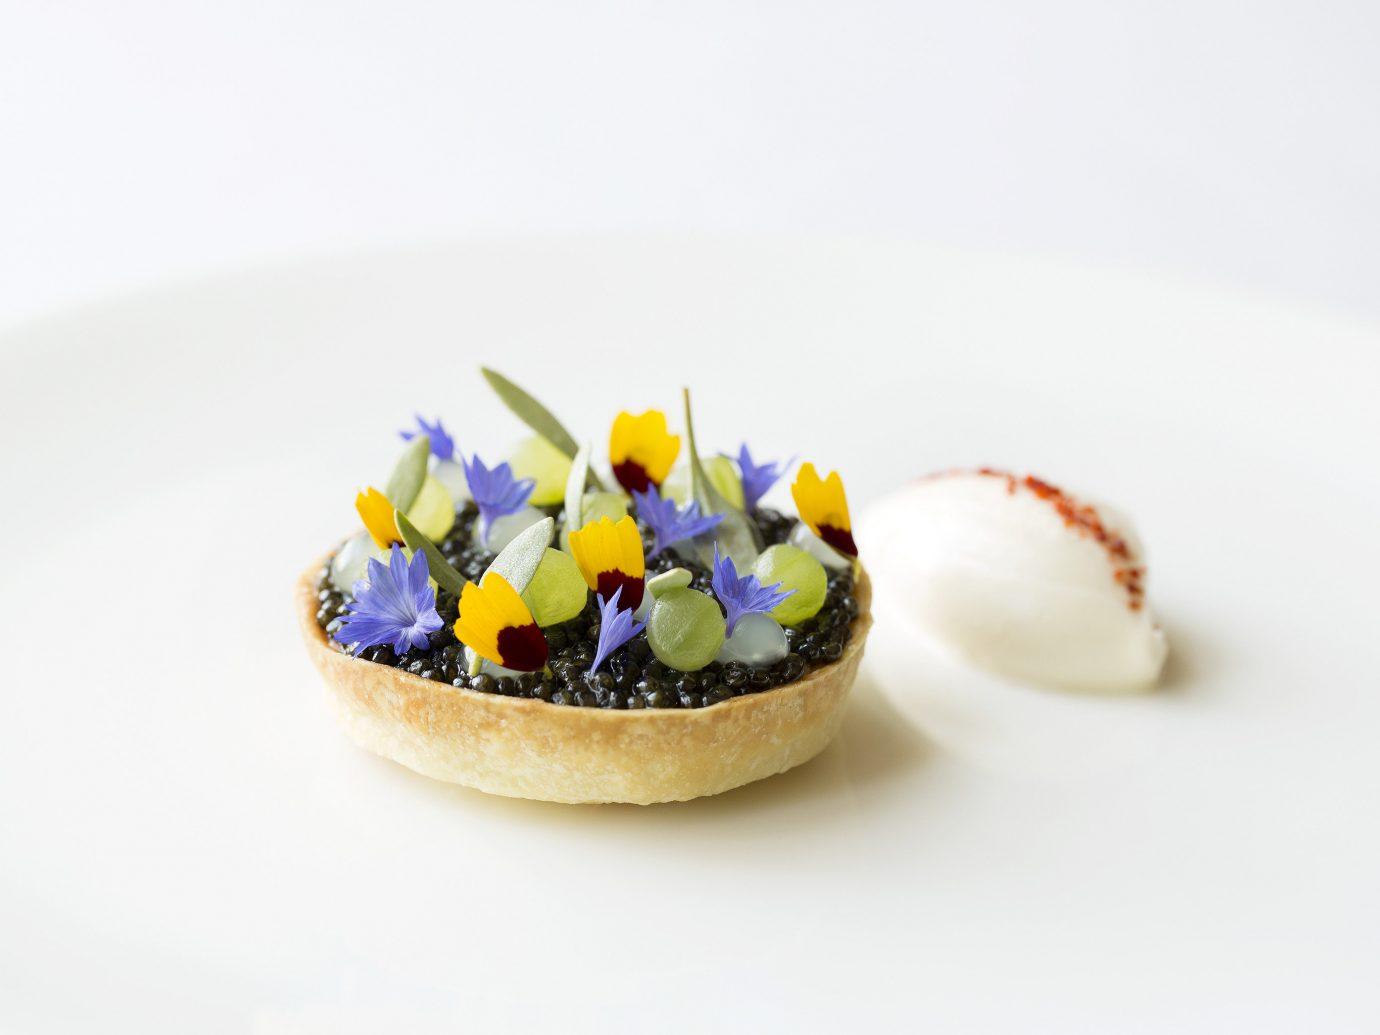 England europe London Luxury Travel Romantic Hotels plate table indoor dessert food finger food arranged